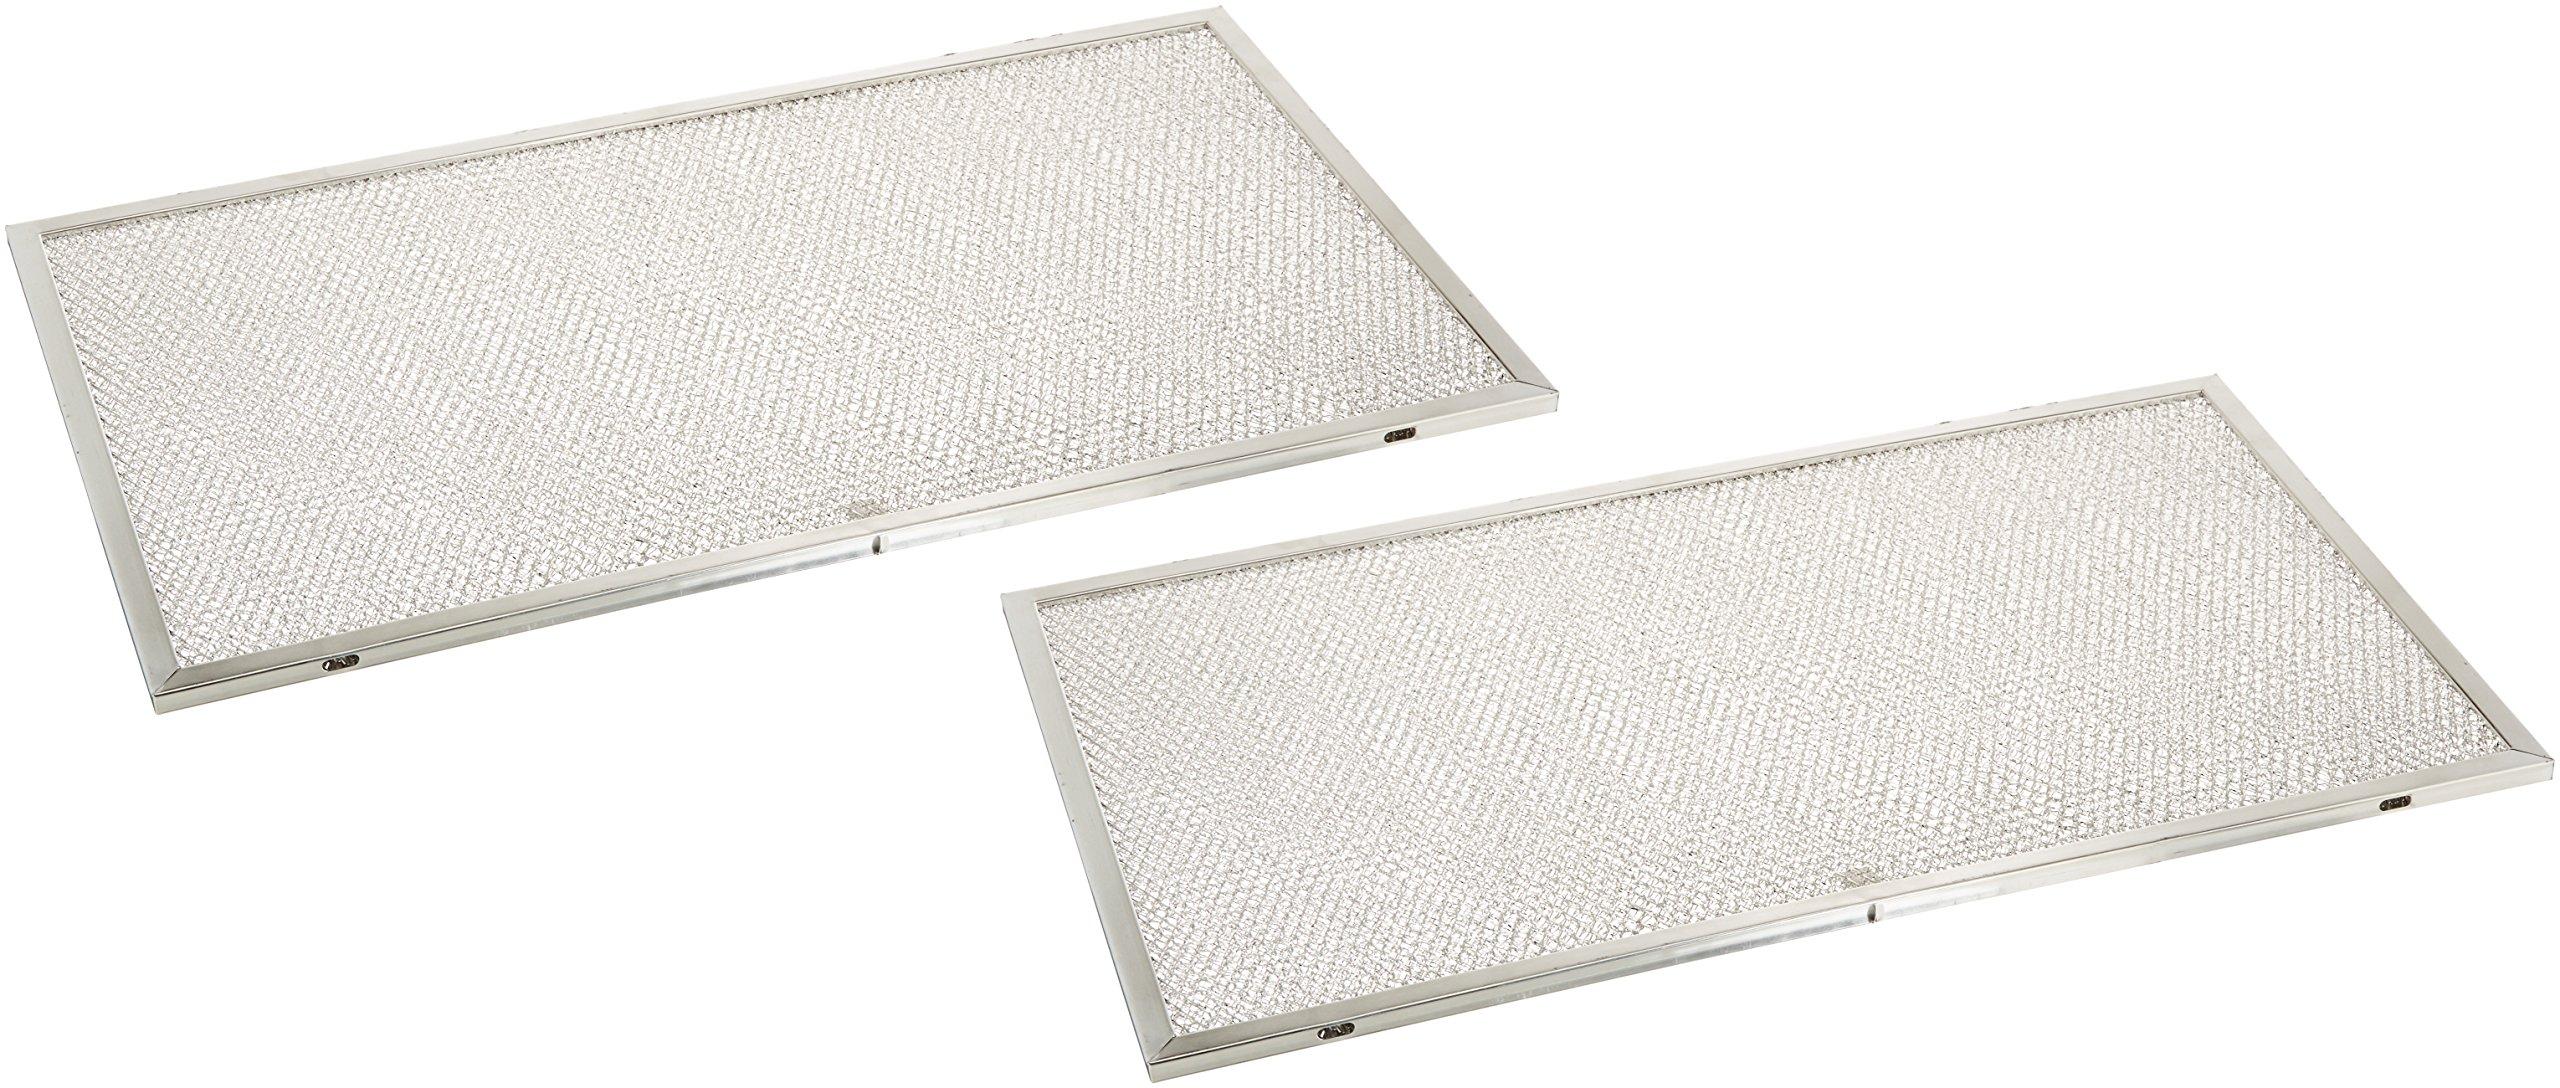 Broan S99010301 Aluminum Filter Kit for 42'' Hood